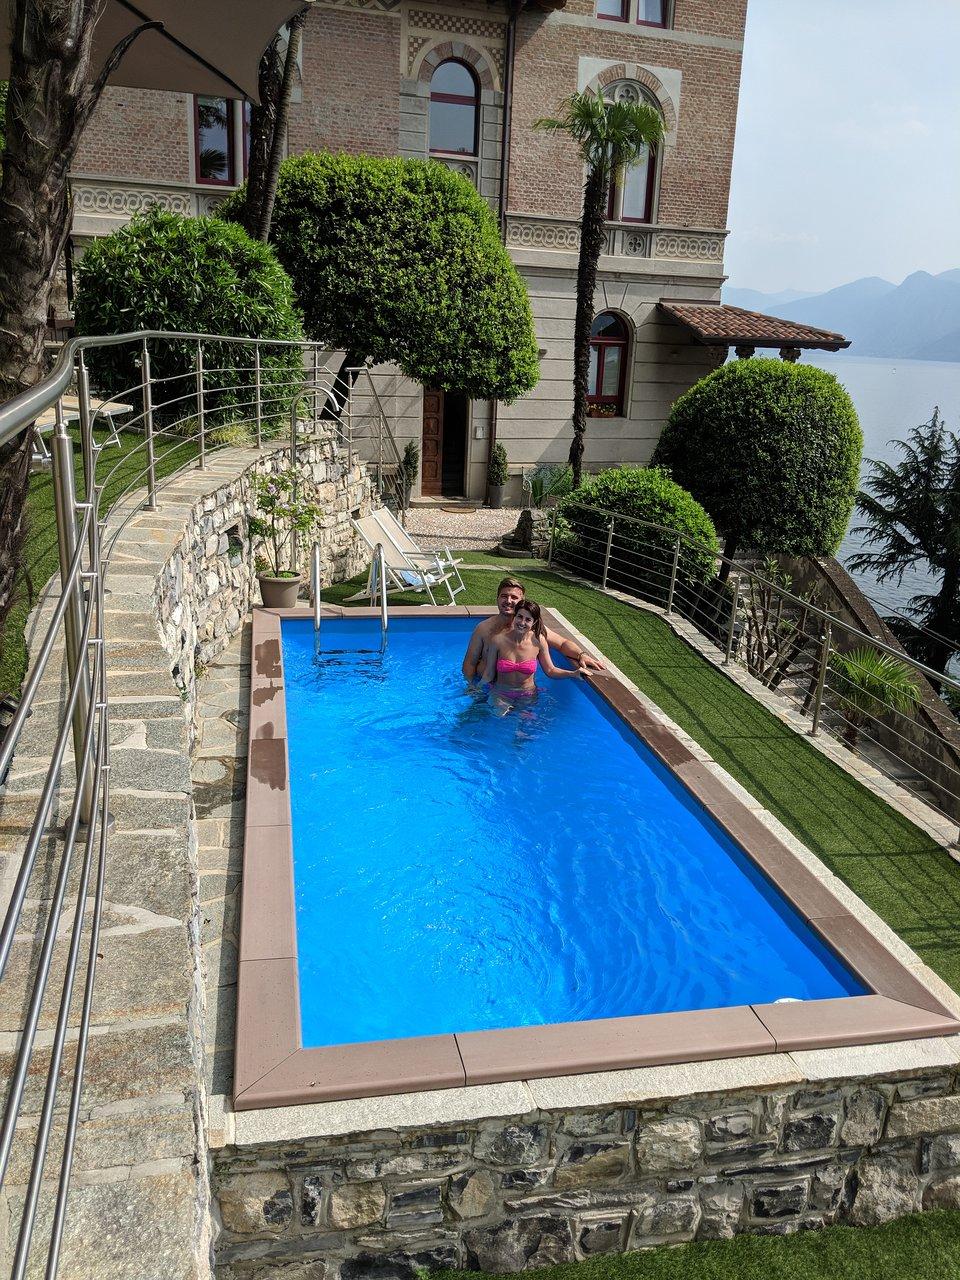 villa monti updated 2019 prices apartment reviews and photos rh tripadvisor co uk